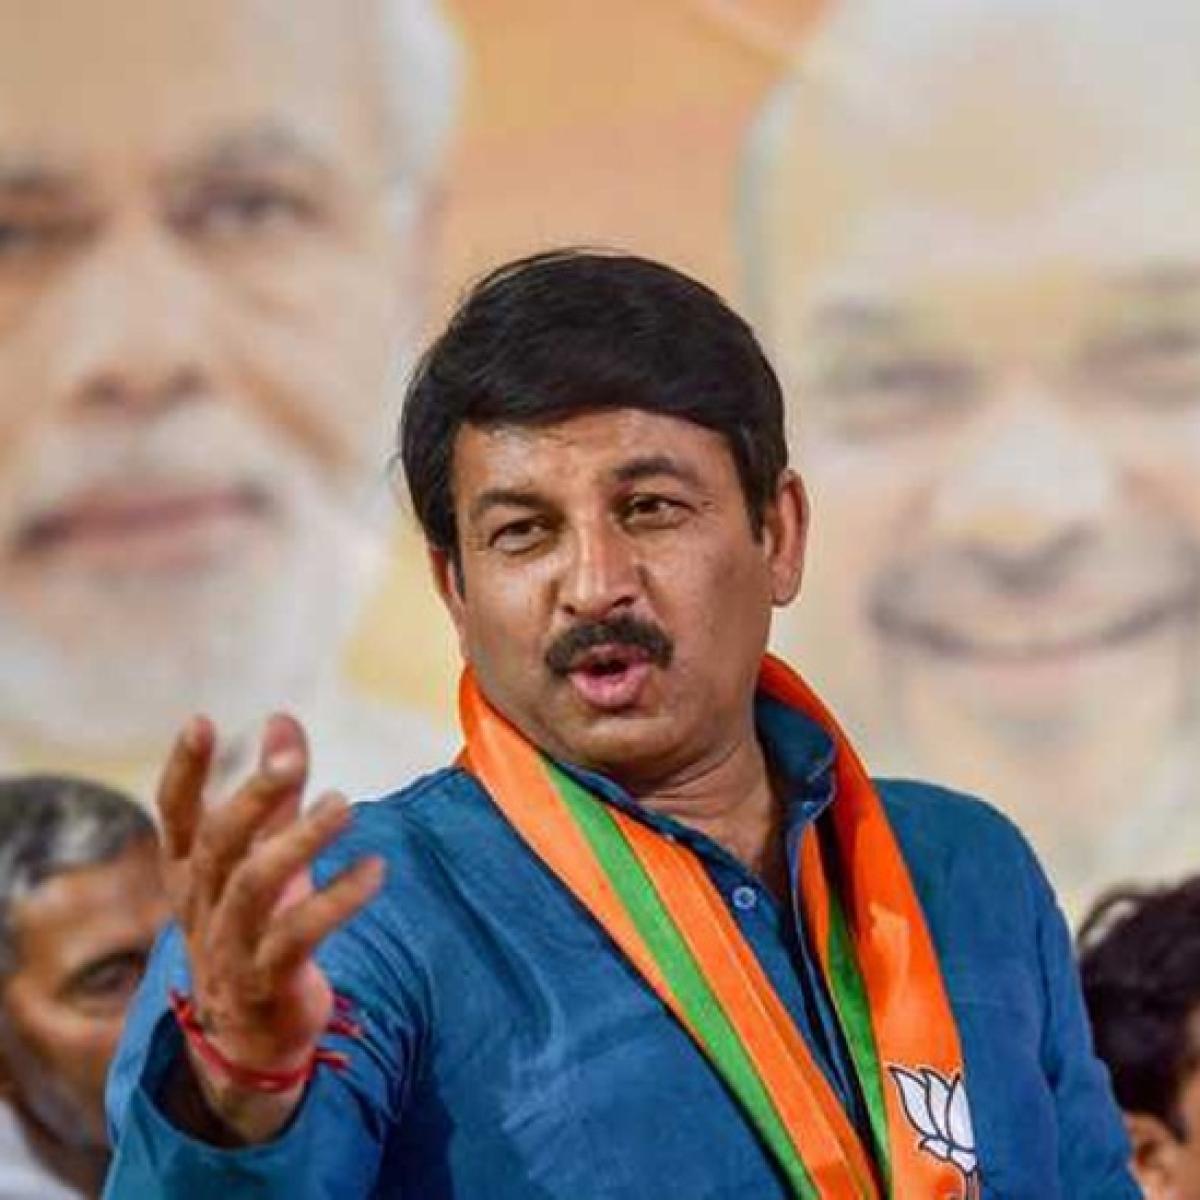 BJP says Delhi minister involved in Hauz Qazi incident; AAP hits back